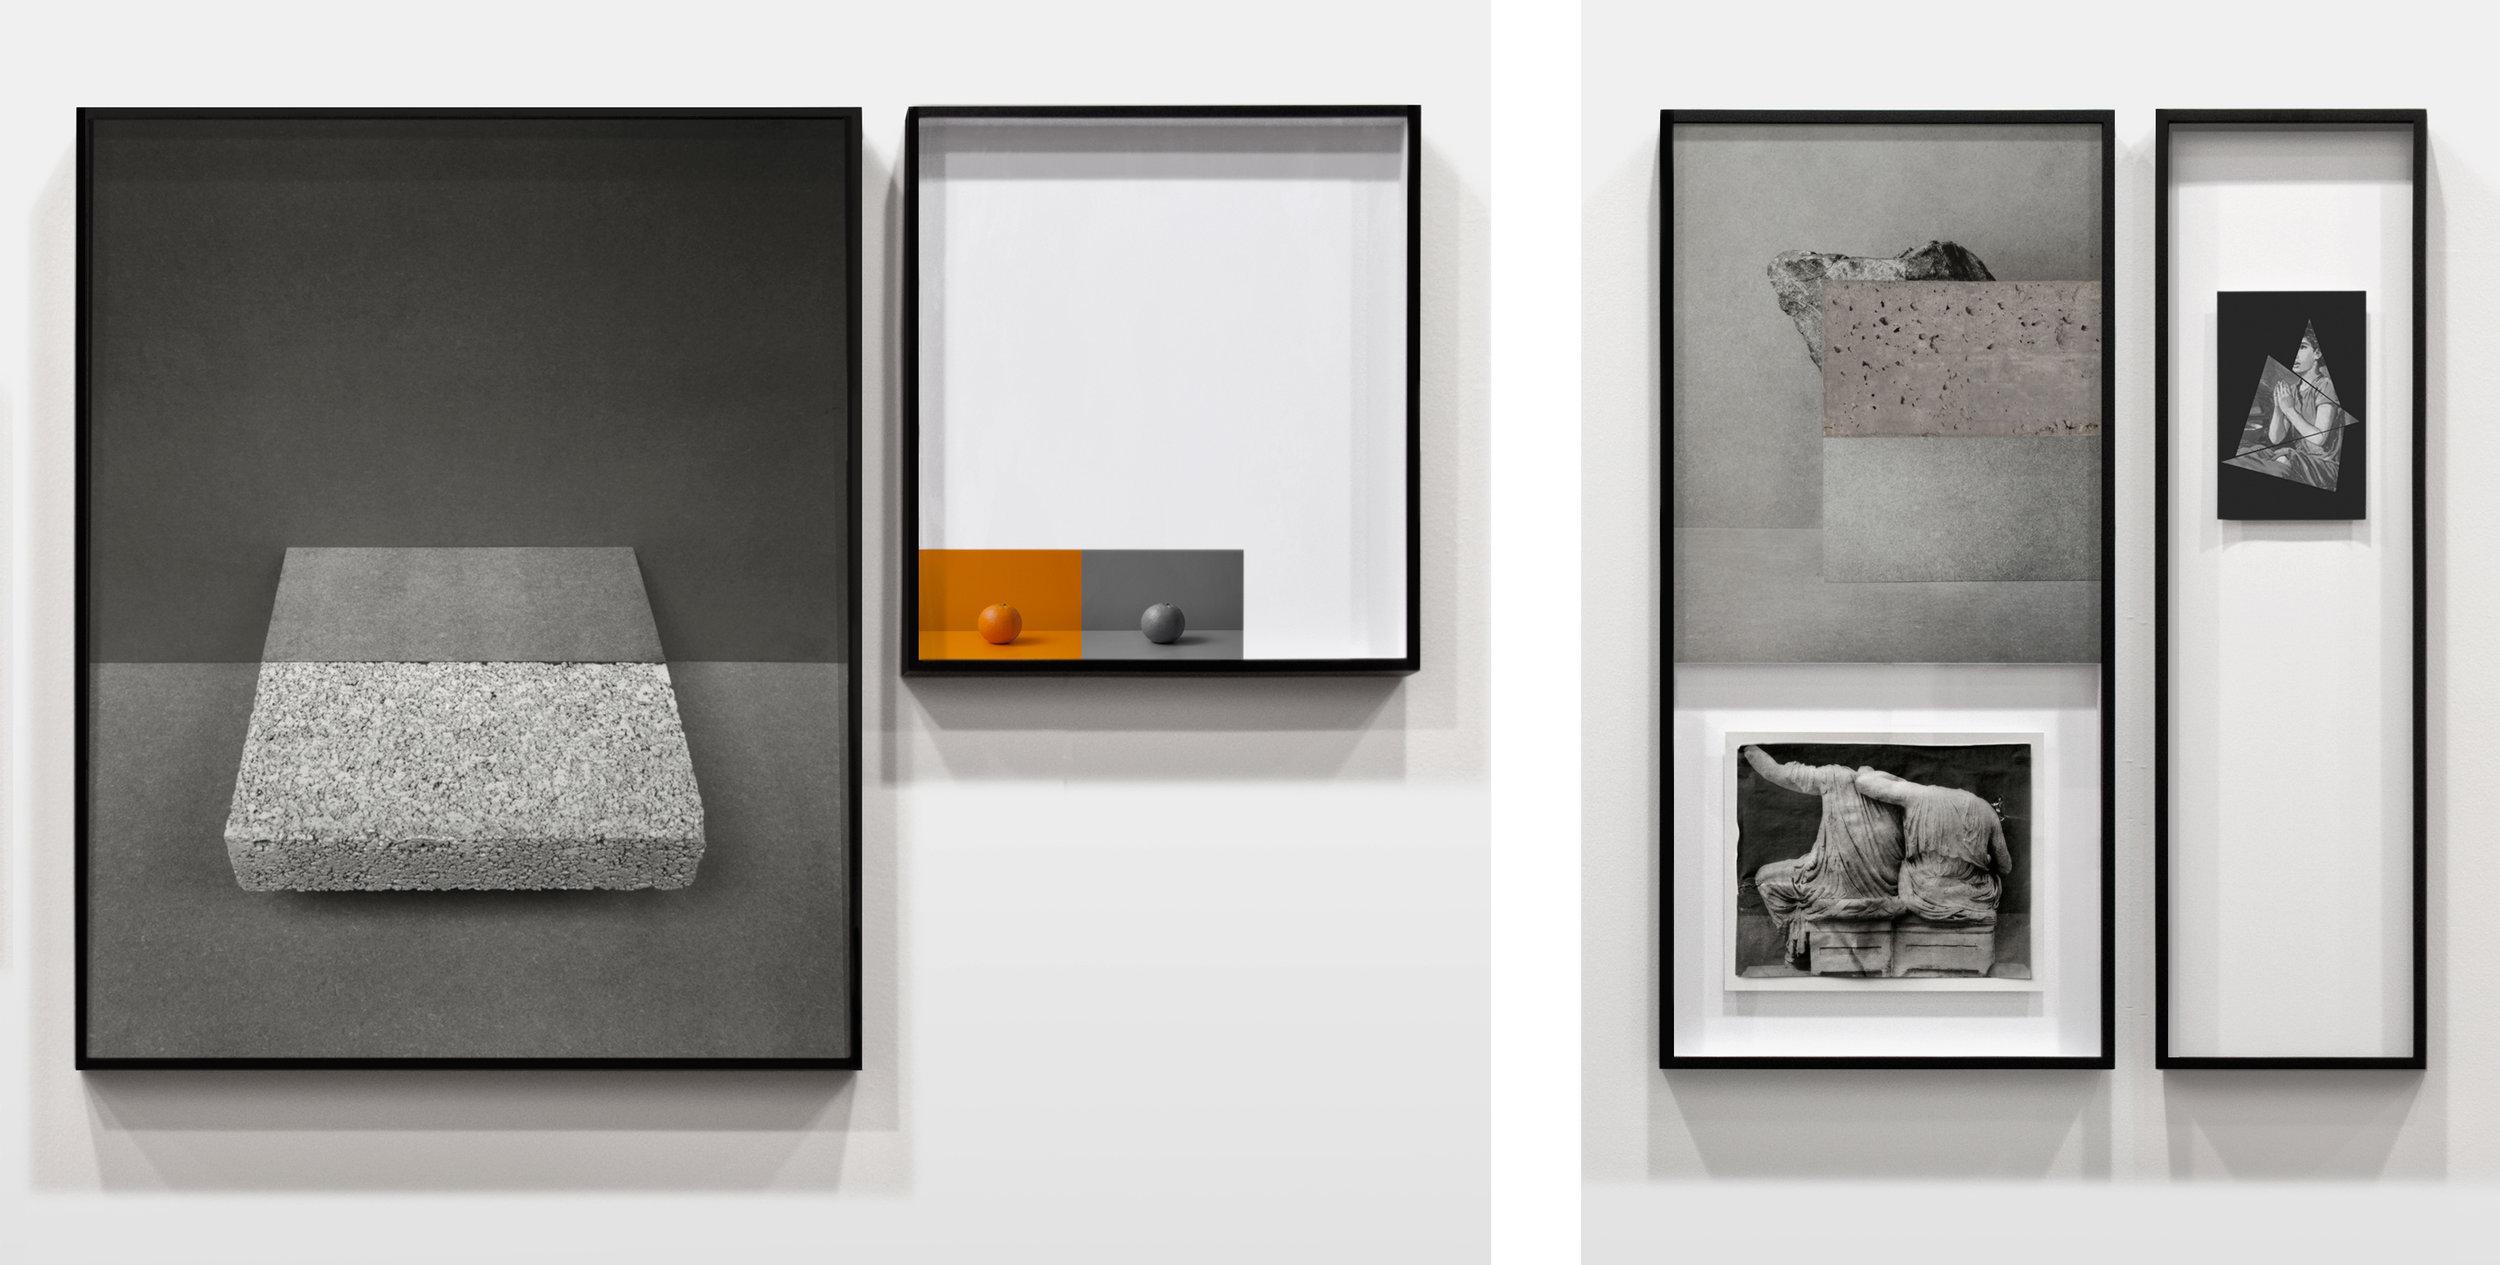 (M12-13) Metalepsis fig.12-13 (installation view) various print materials, 2014 / (M 5-7) Metalpsis fig.5-7 (installation view) various print materials, 2014